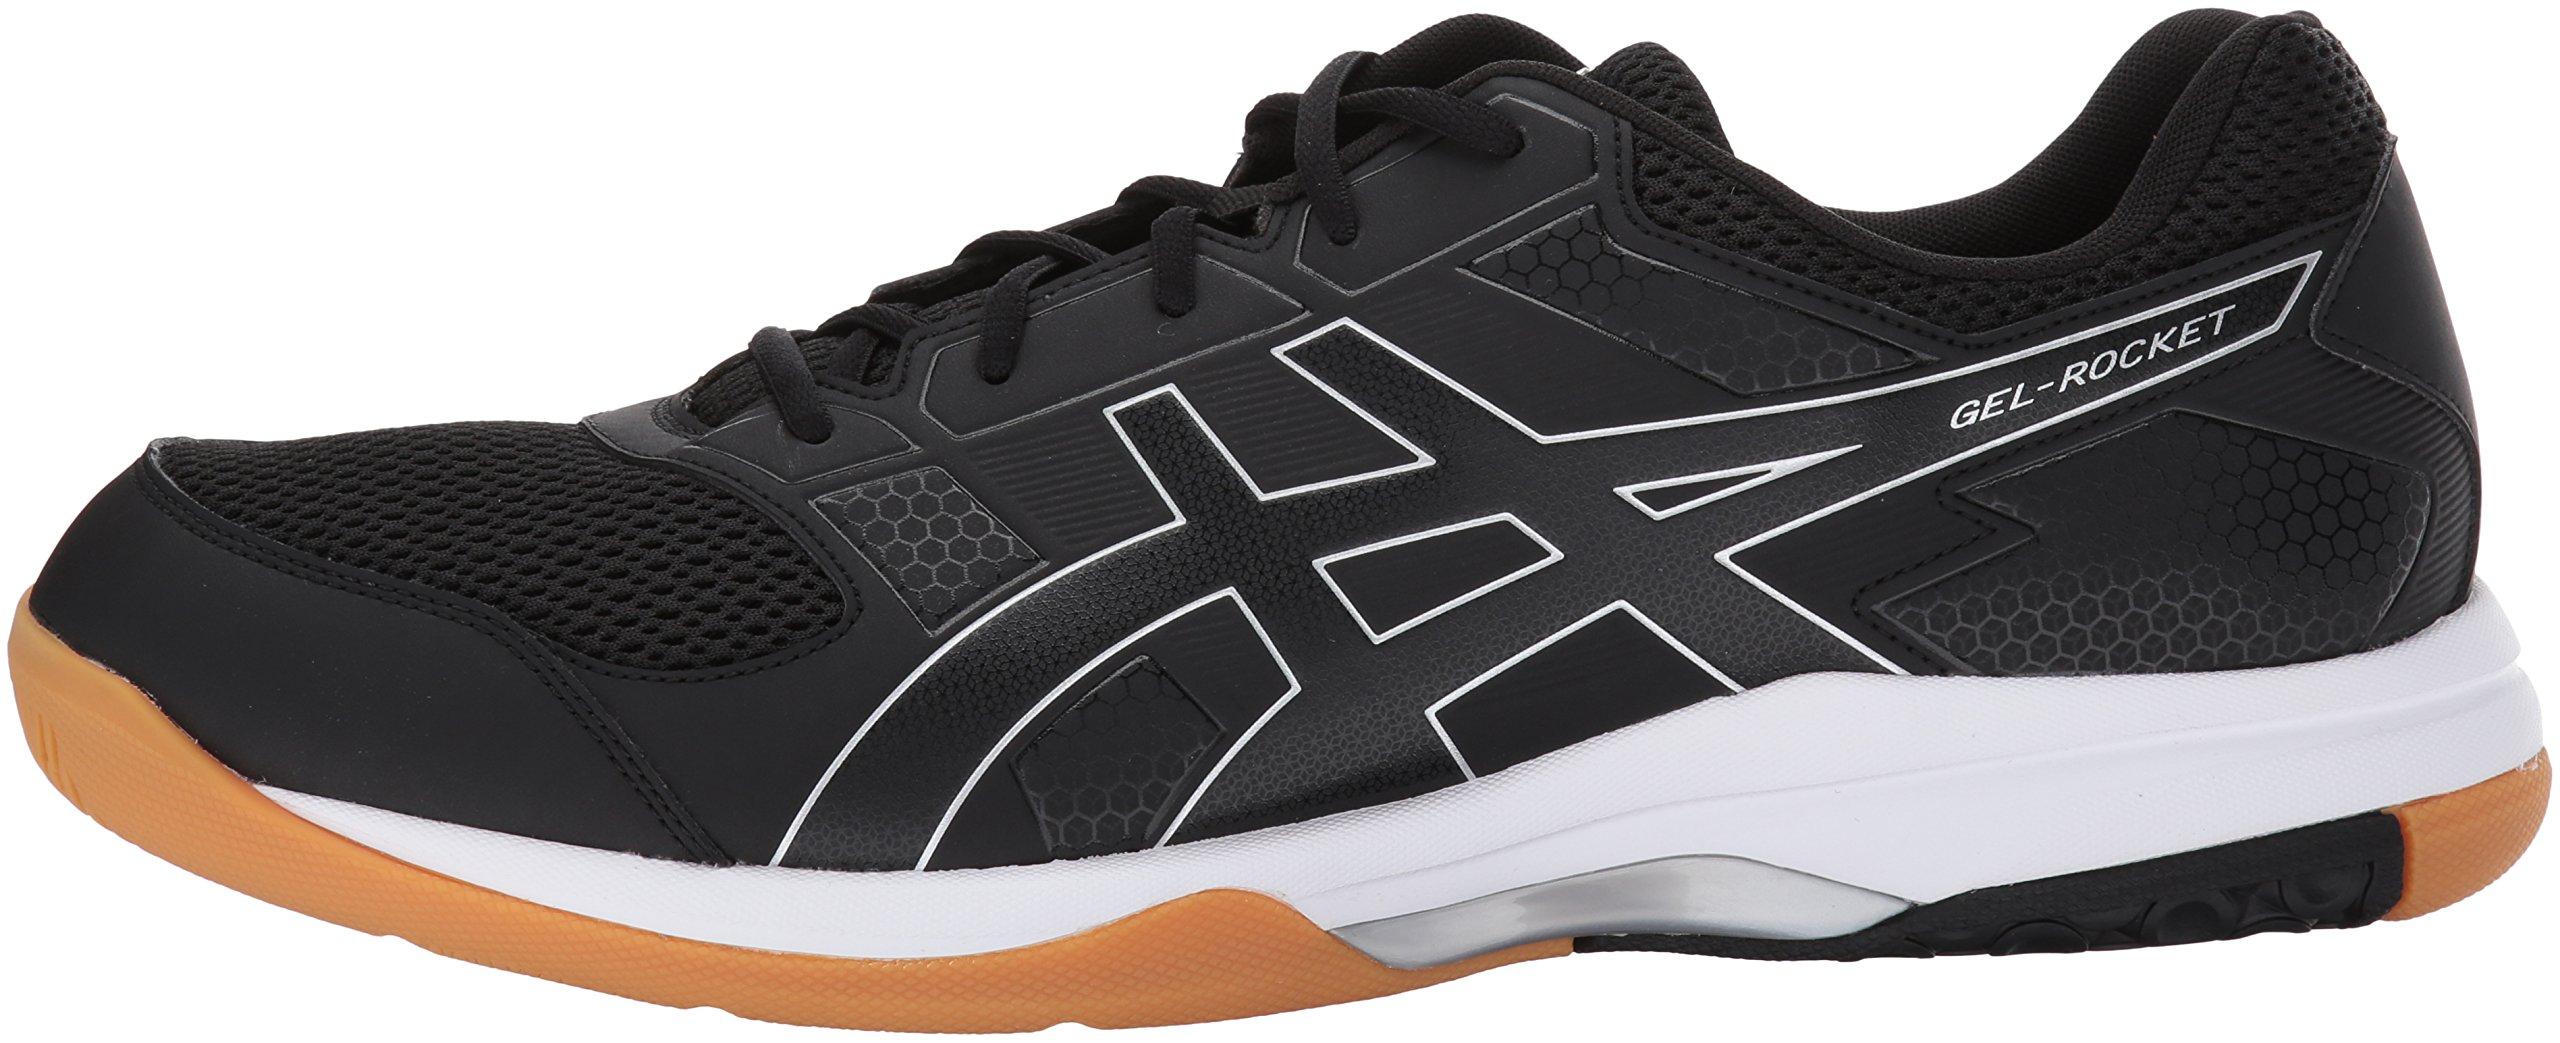 ASICS Mens Gel-Rocket 8 Volleyball Shoe Black/White, 7 Medium US by ASICS (Image #5)